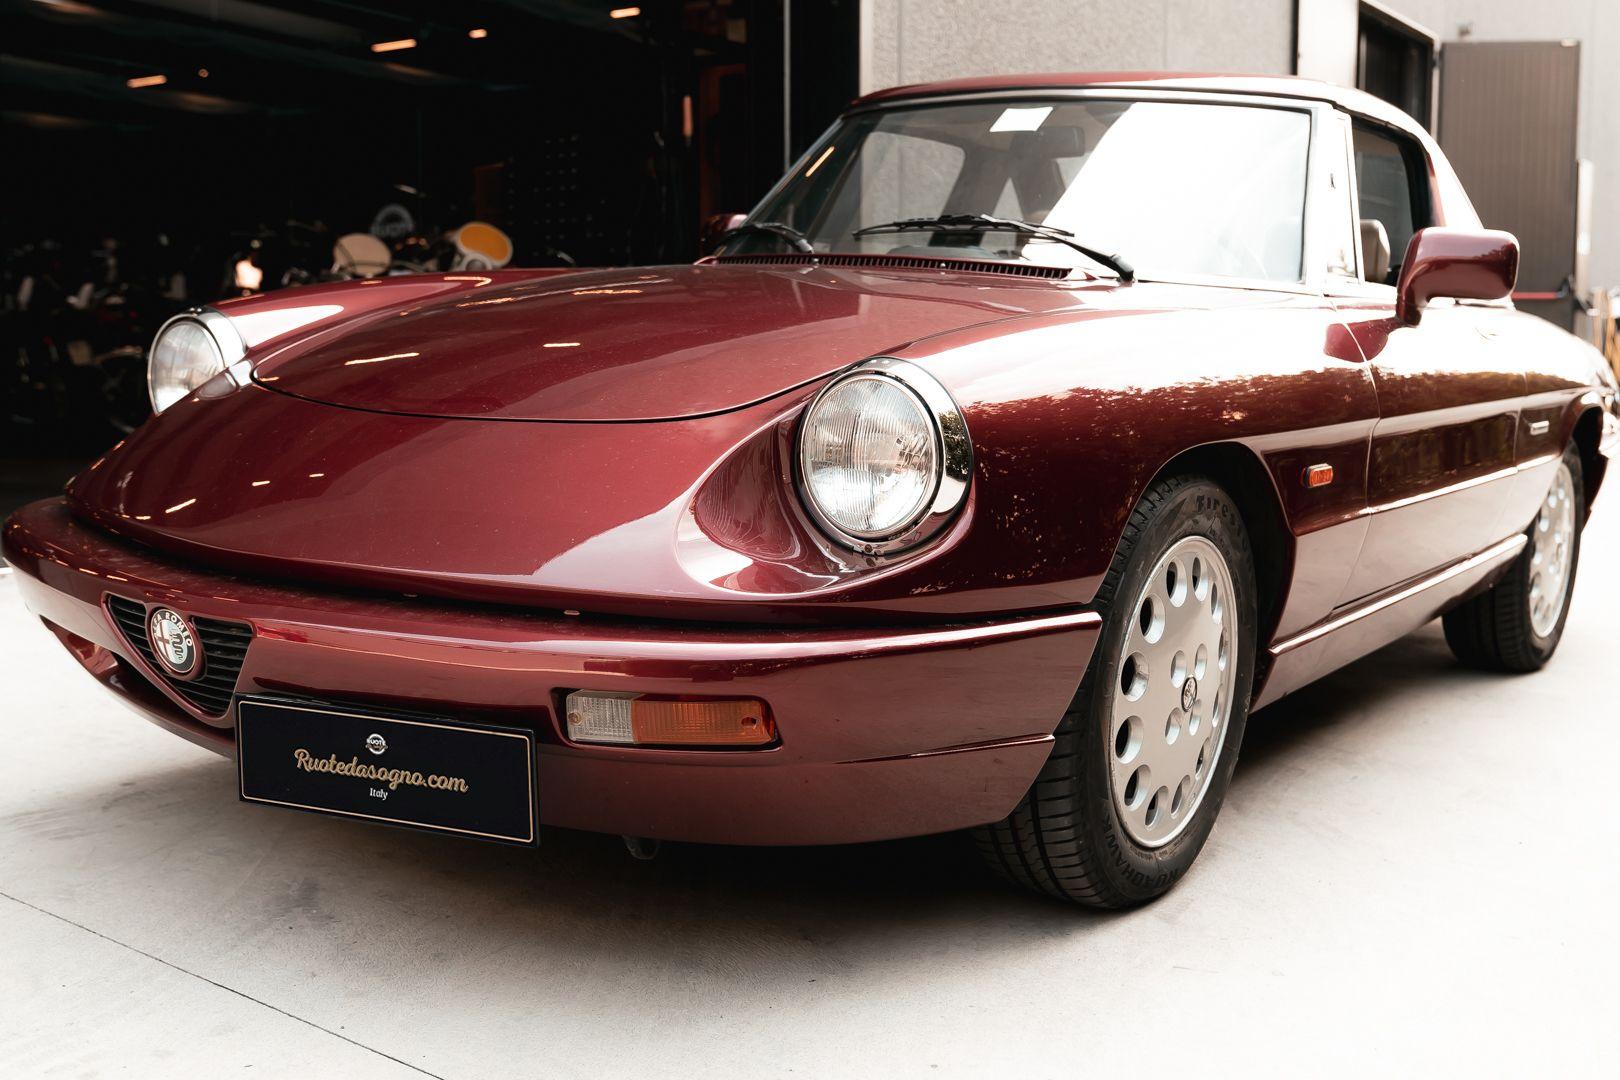 1990 Alfa Romeo Duetto 2000 IV Serie 79763